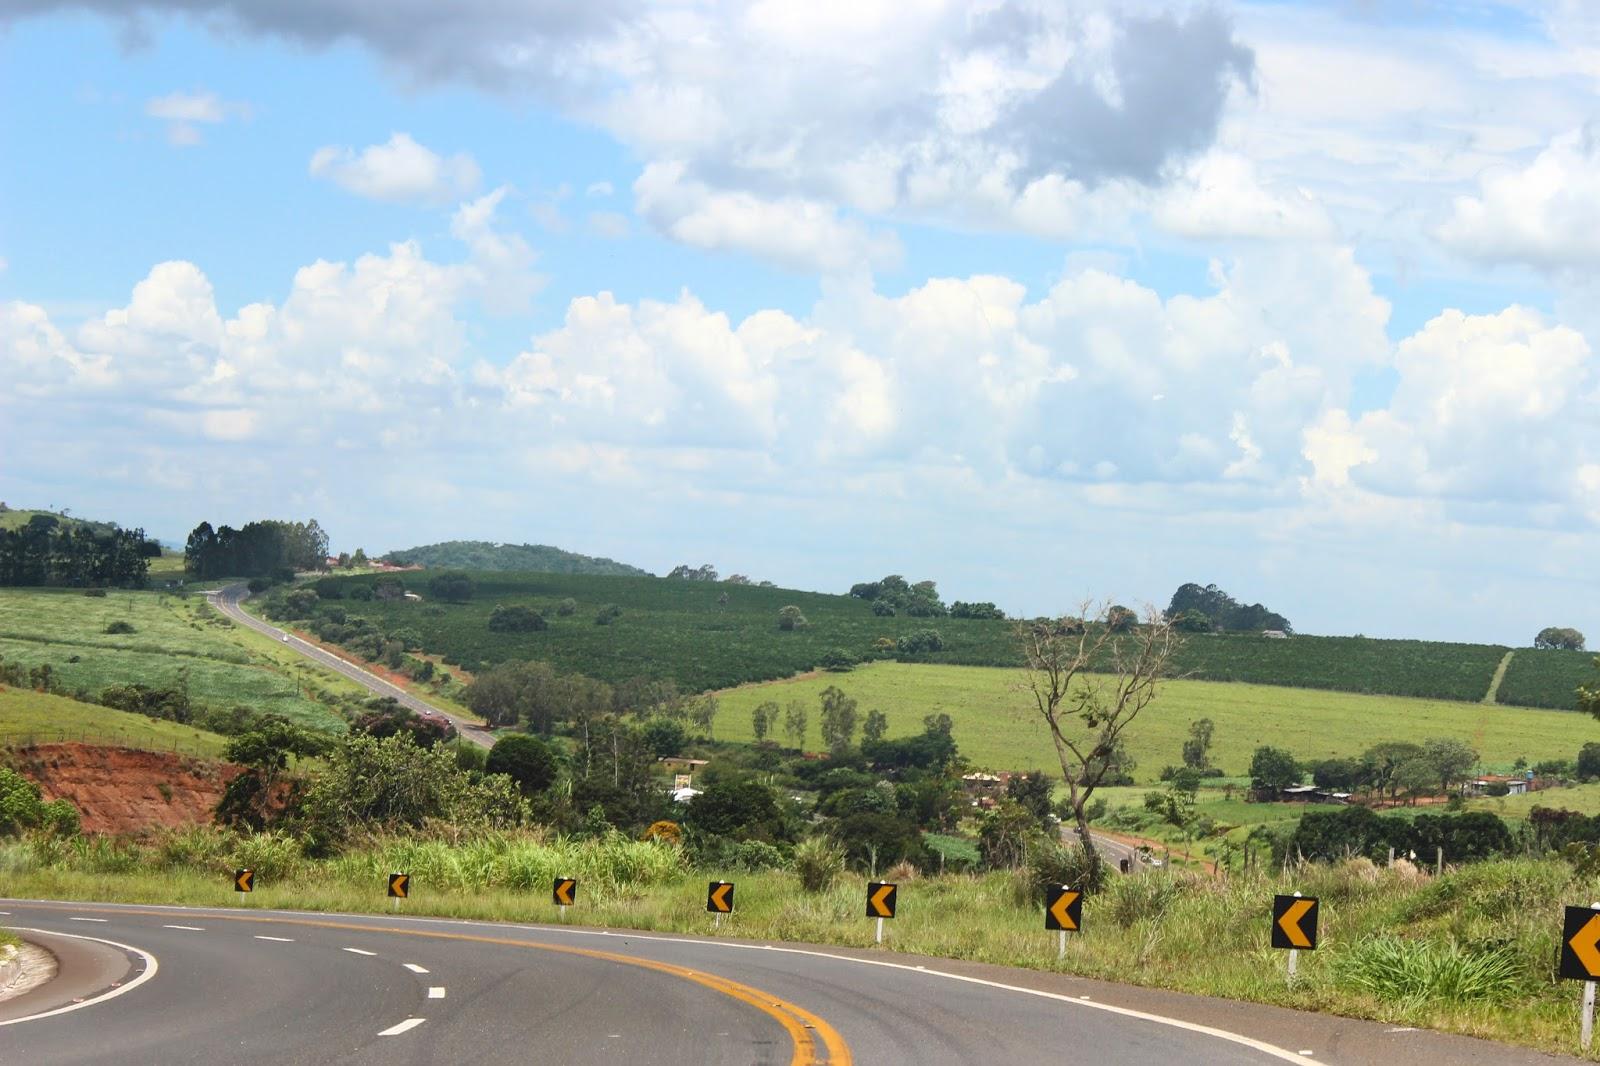 estrada placas de curva